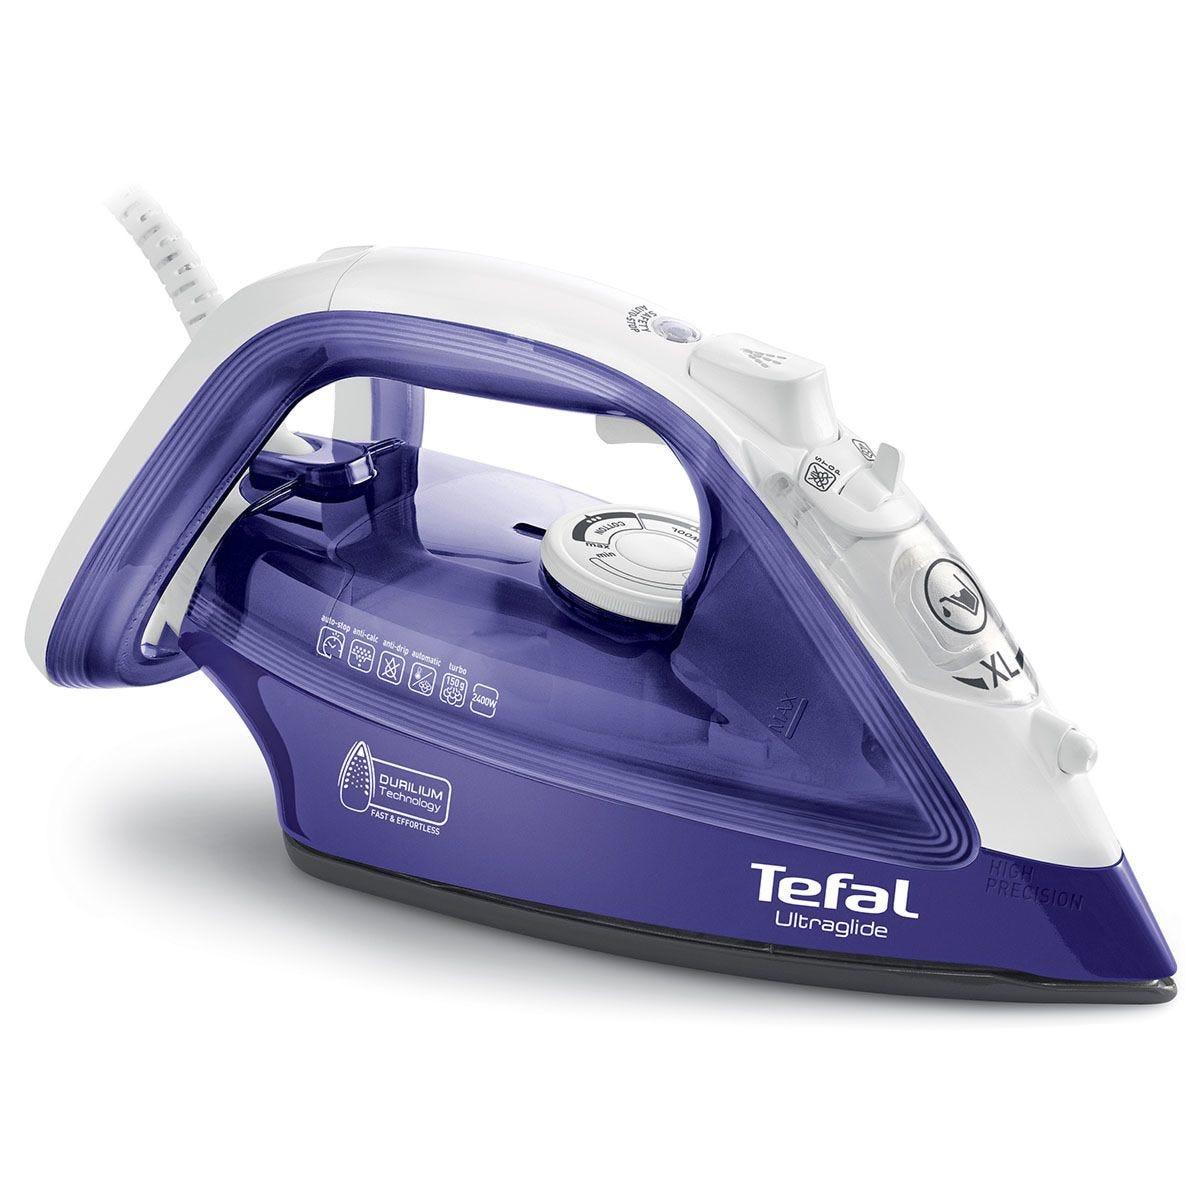 Tefal Ultraglide Steam Iron - White & Purple